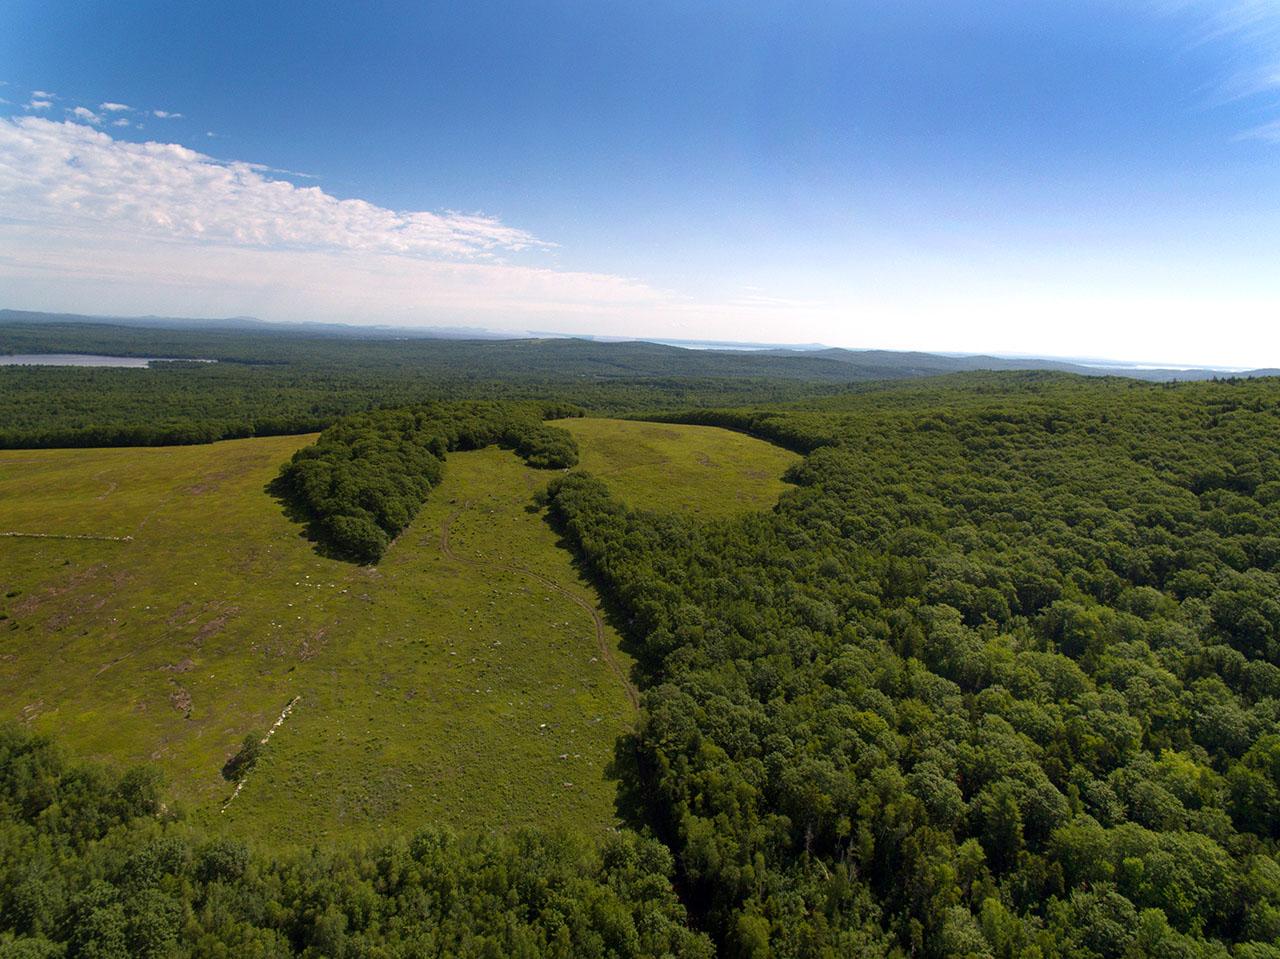 land offerings: Levenseller MT. ME1391_22_CC